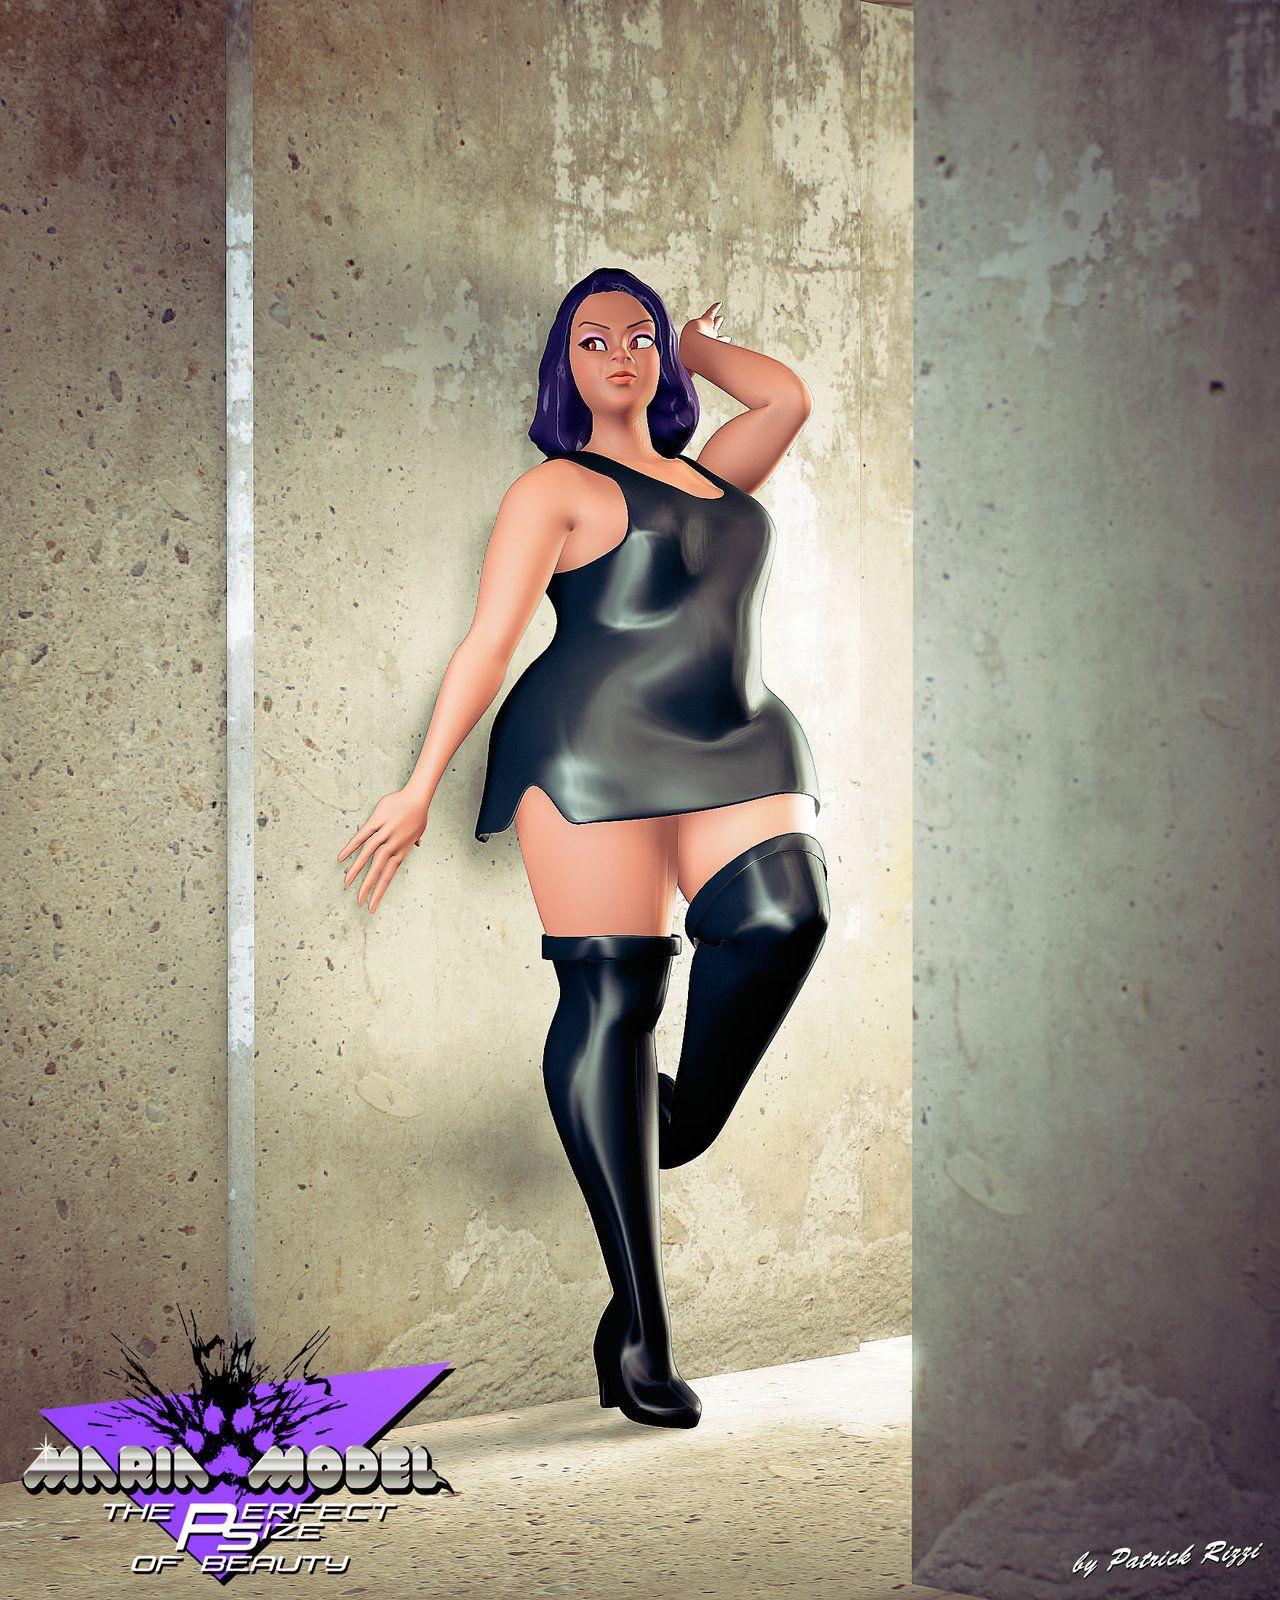 mariablackshiopat.deviantart on @deviantart #curvy #plussize